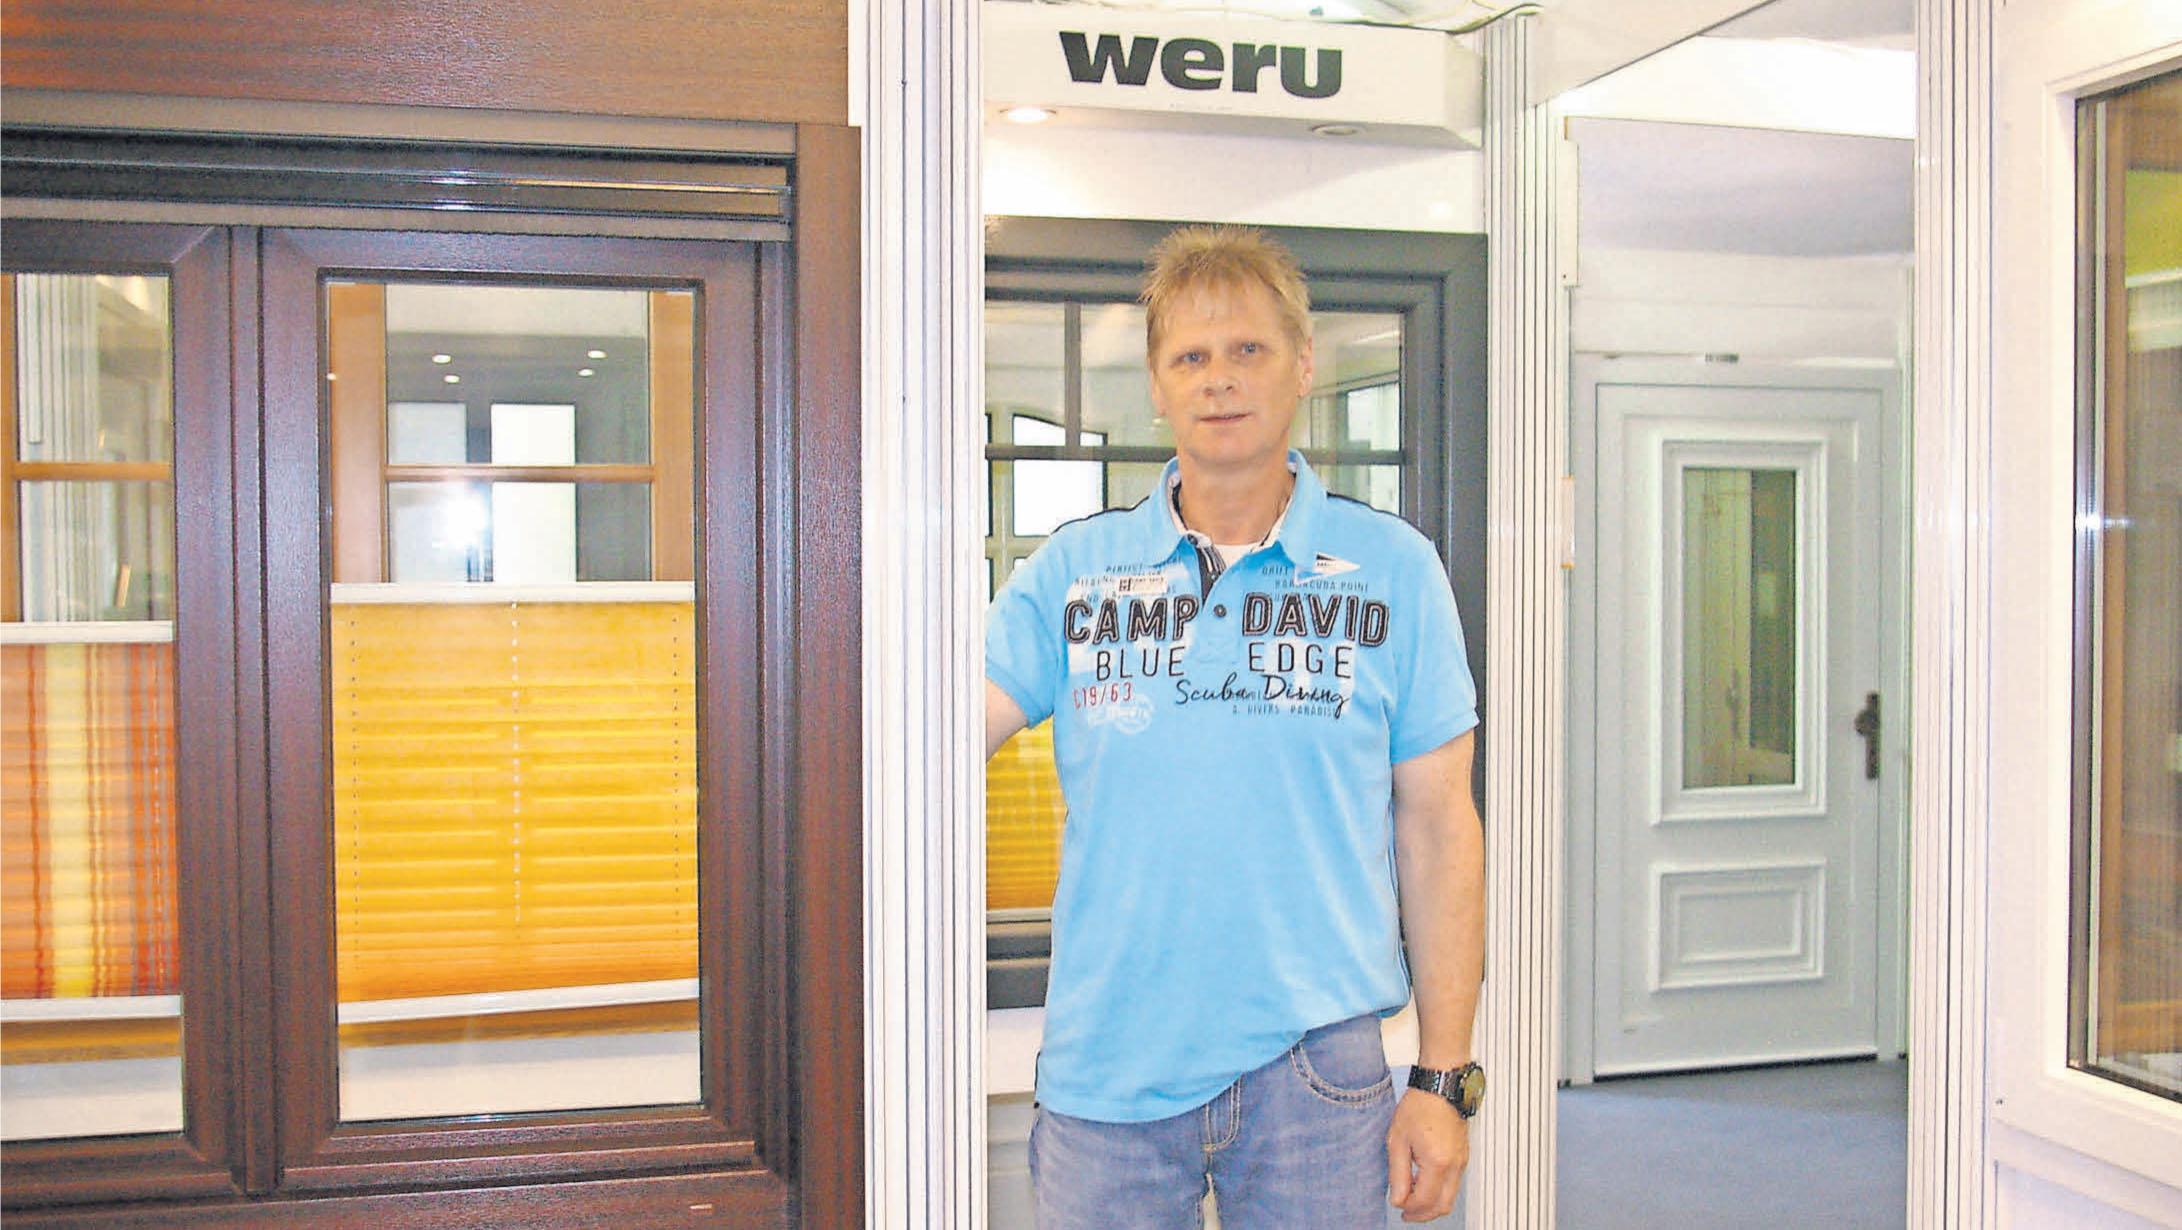 Filialleiter Frank Wagner berät Kunden bei Bautechnik Bade in Burgdorf.